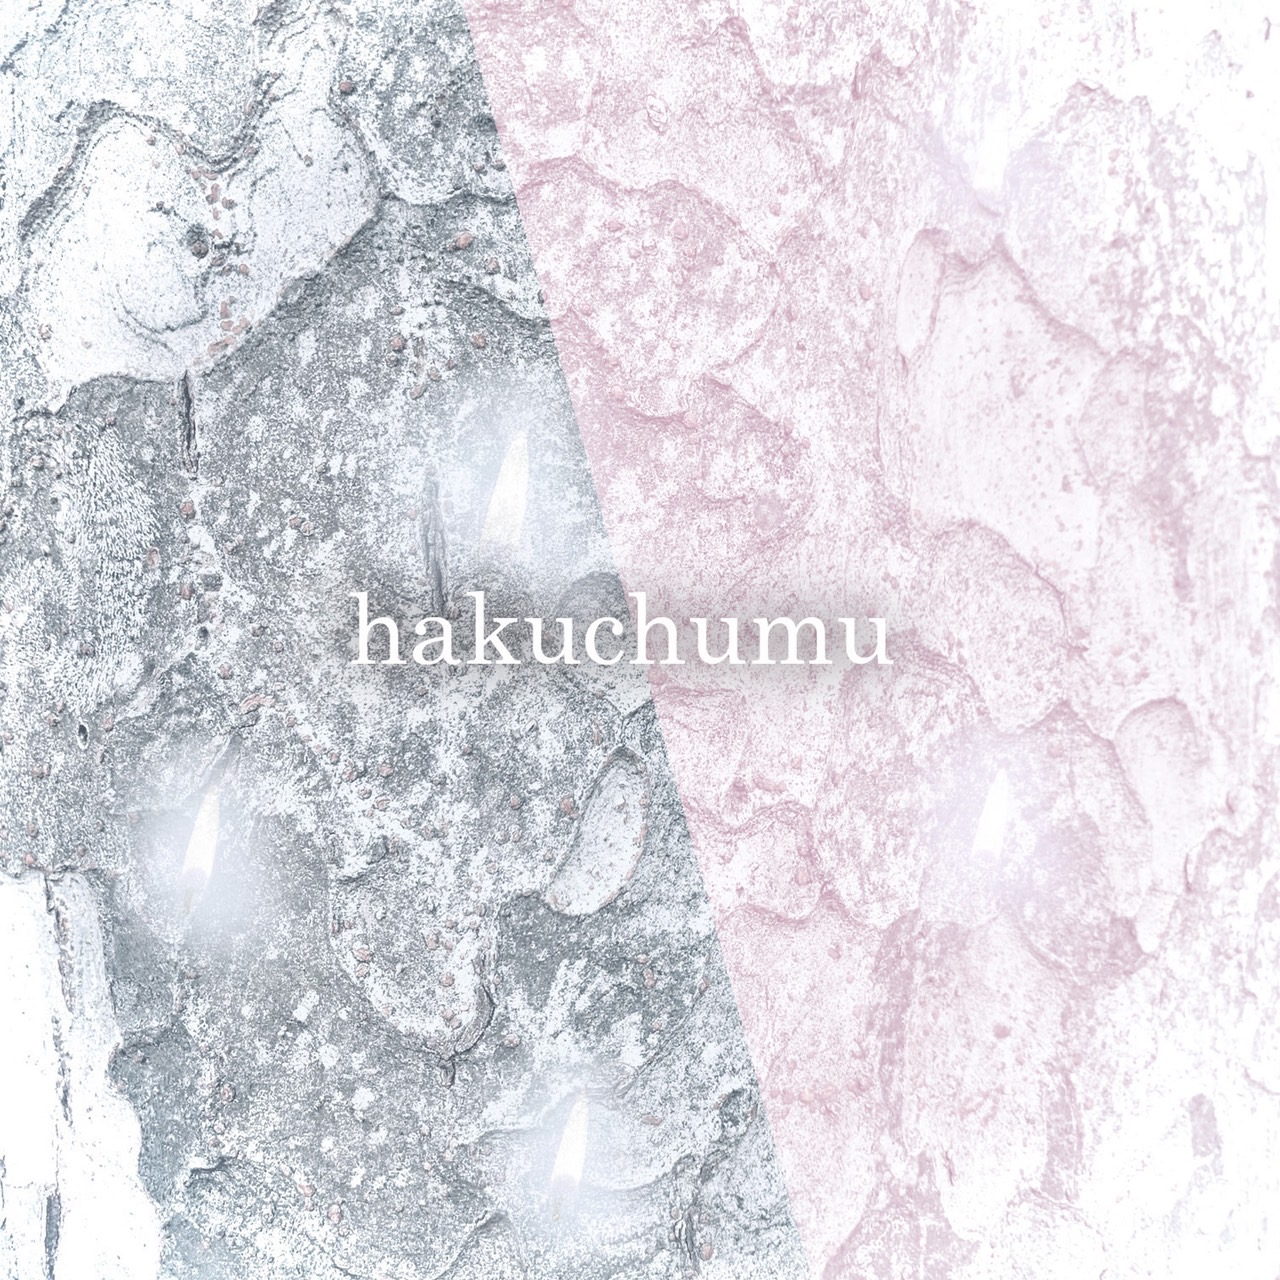 hakuchumu 第2回開催のお知らせ。